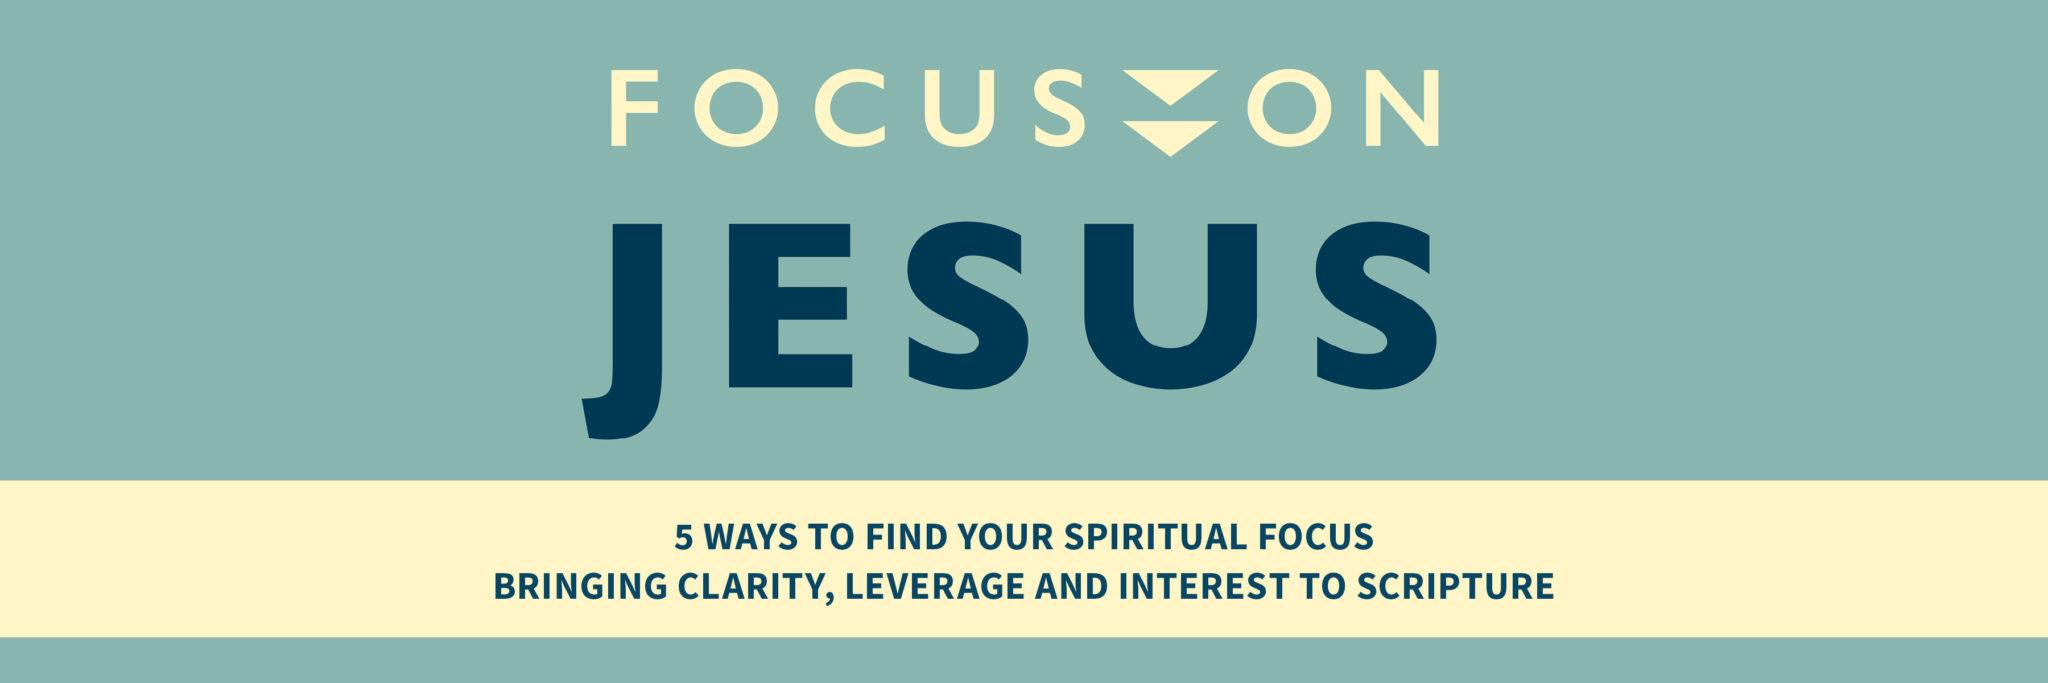 Focus-on-Jesus-header-v2-2048x683